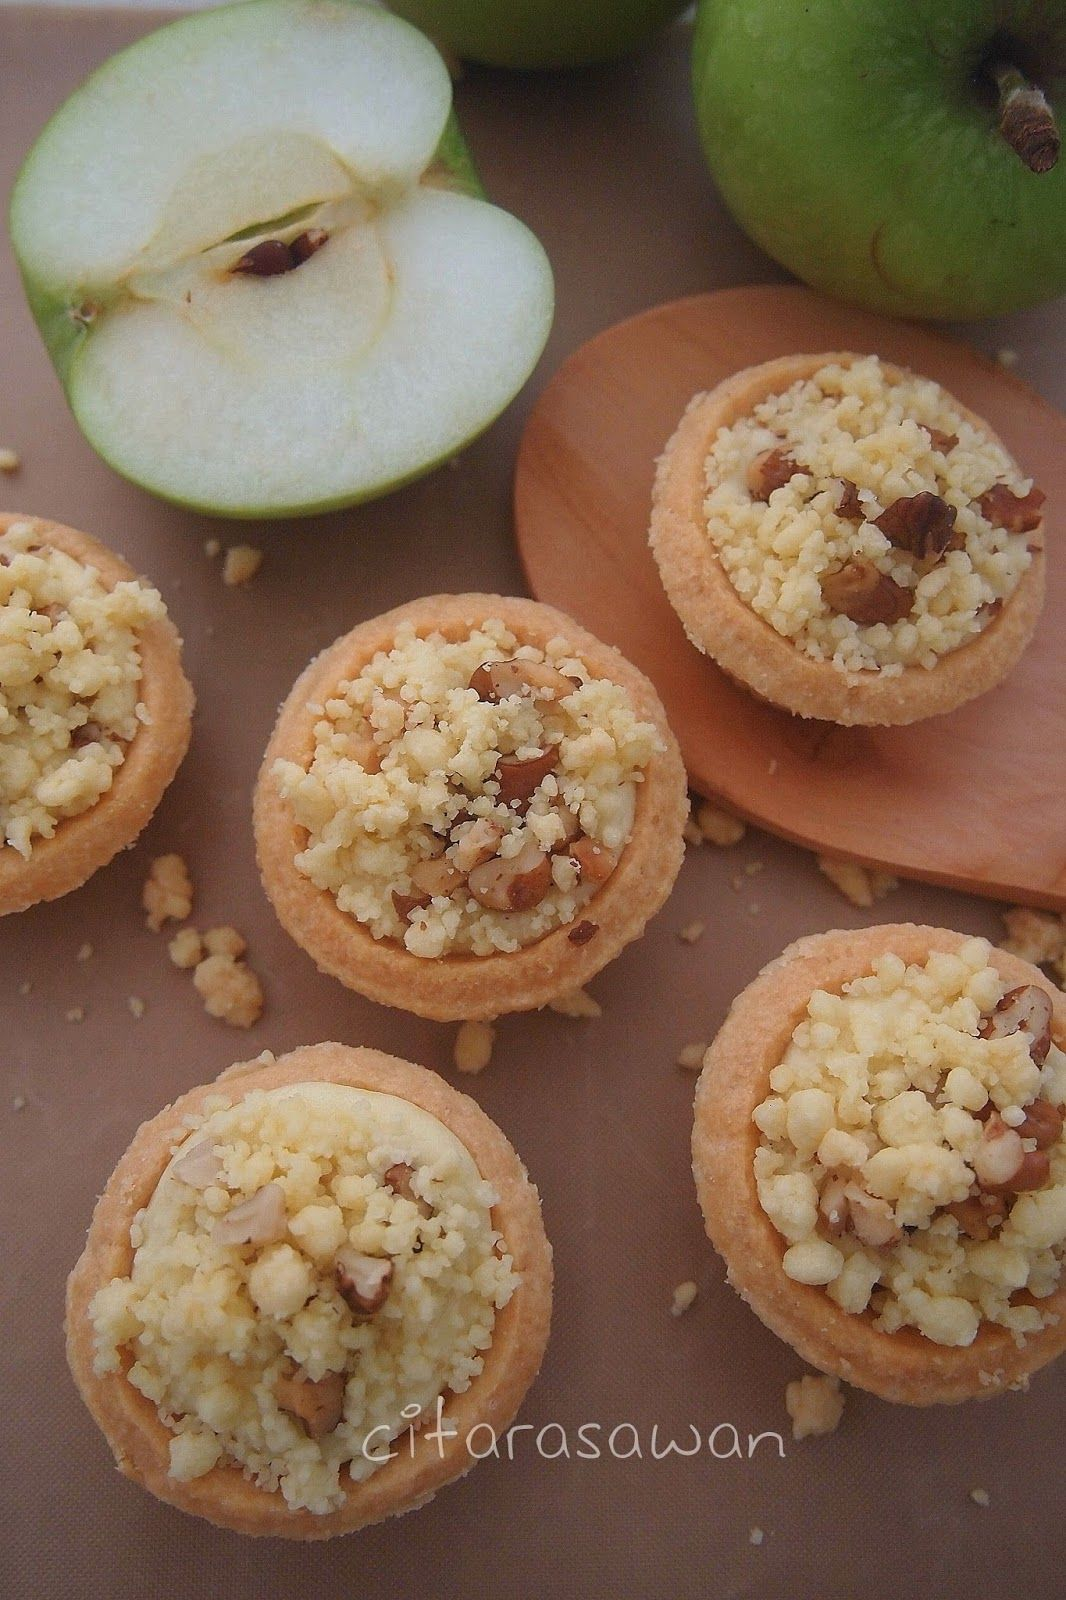 Apple Crumble Cheese Tart Recipes Resep Makanan Tar Makanan Dan Minuman